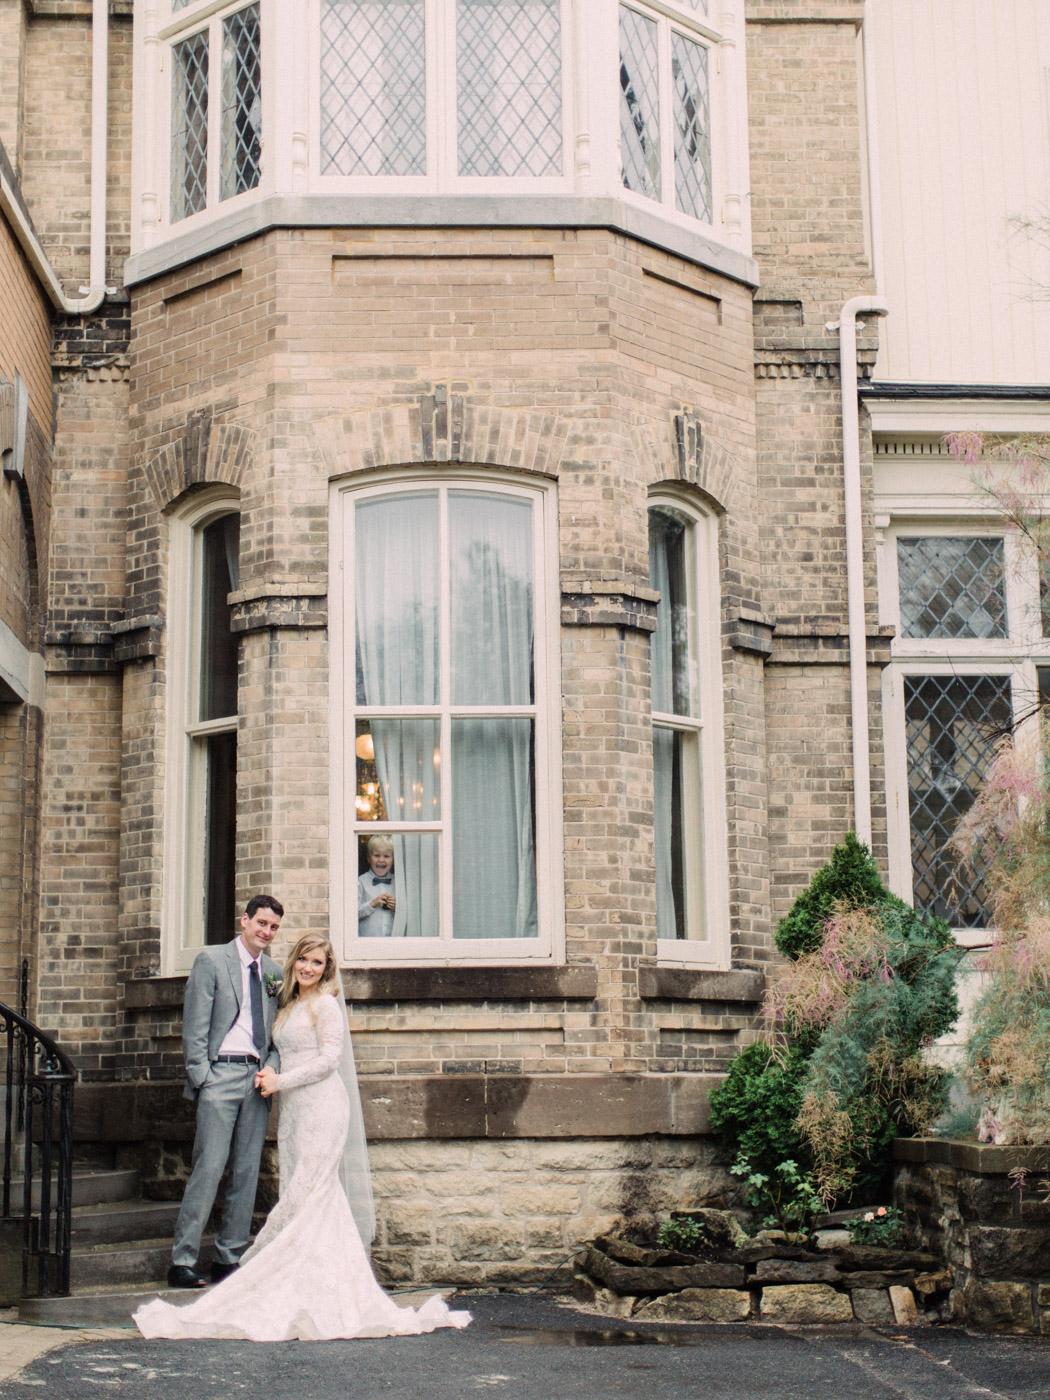 Toronto-wedding-photographer-intimate-classic-fine-art-elopement-ottawa53.jpg